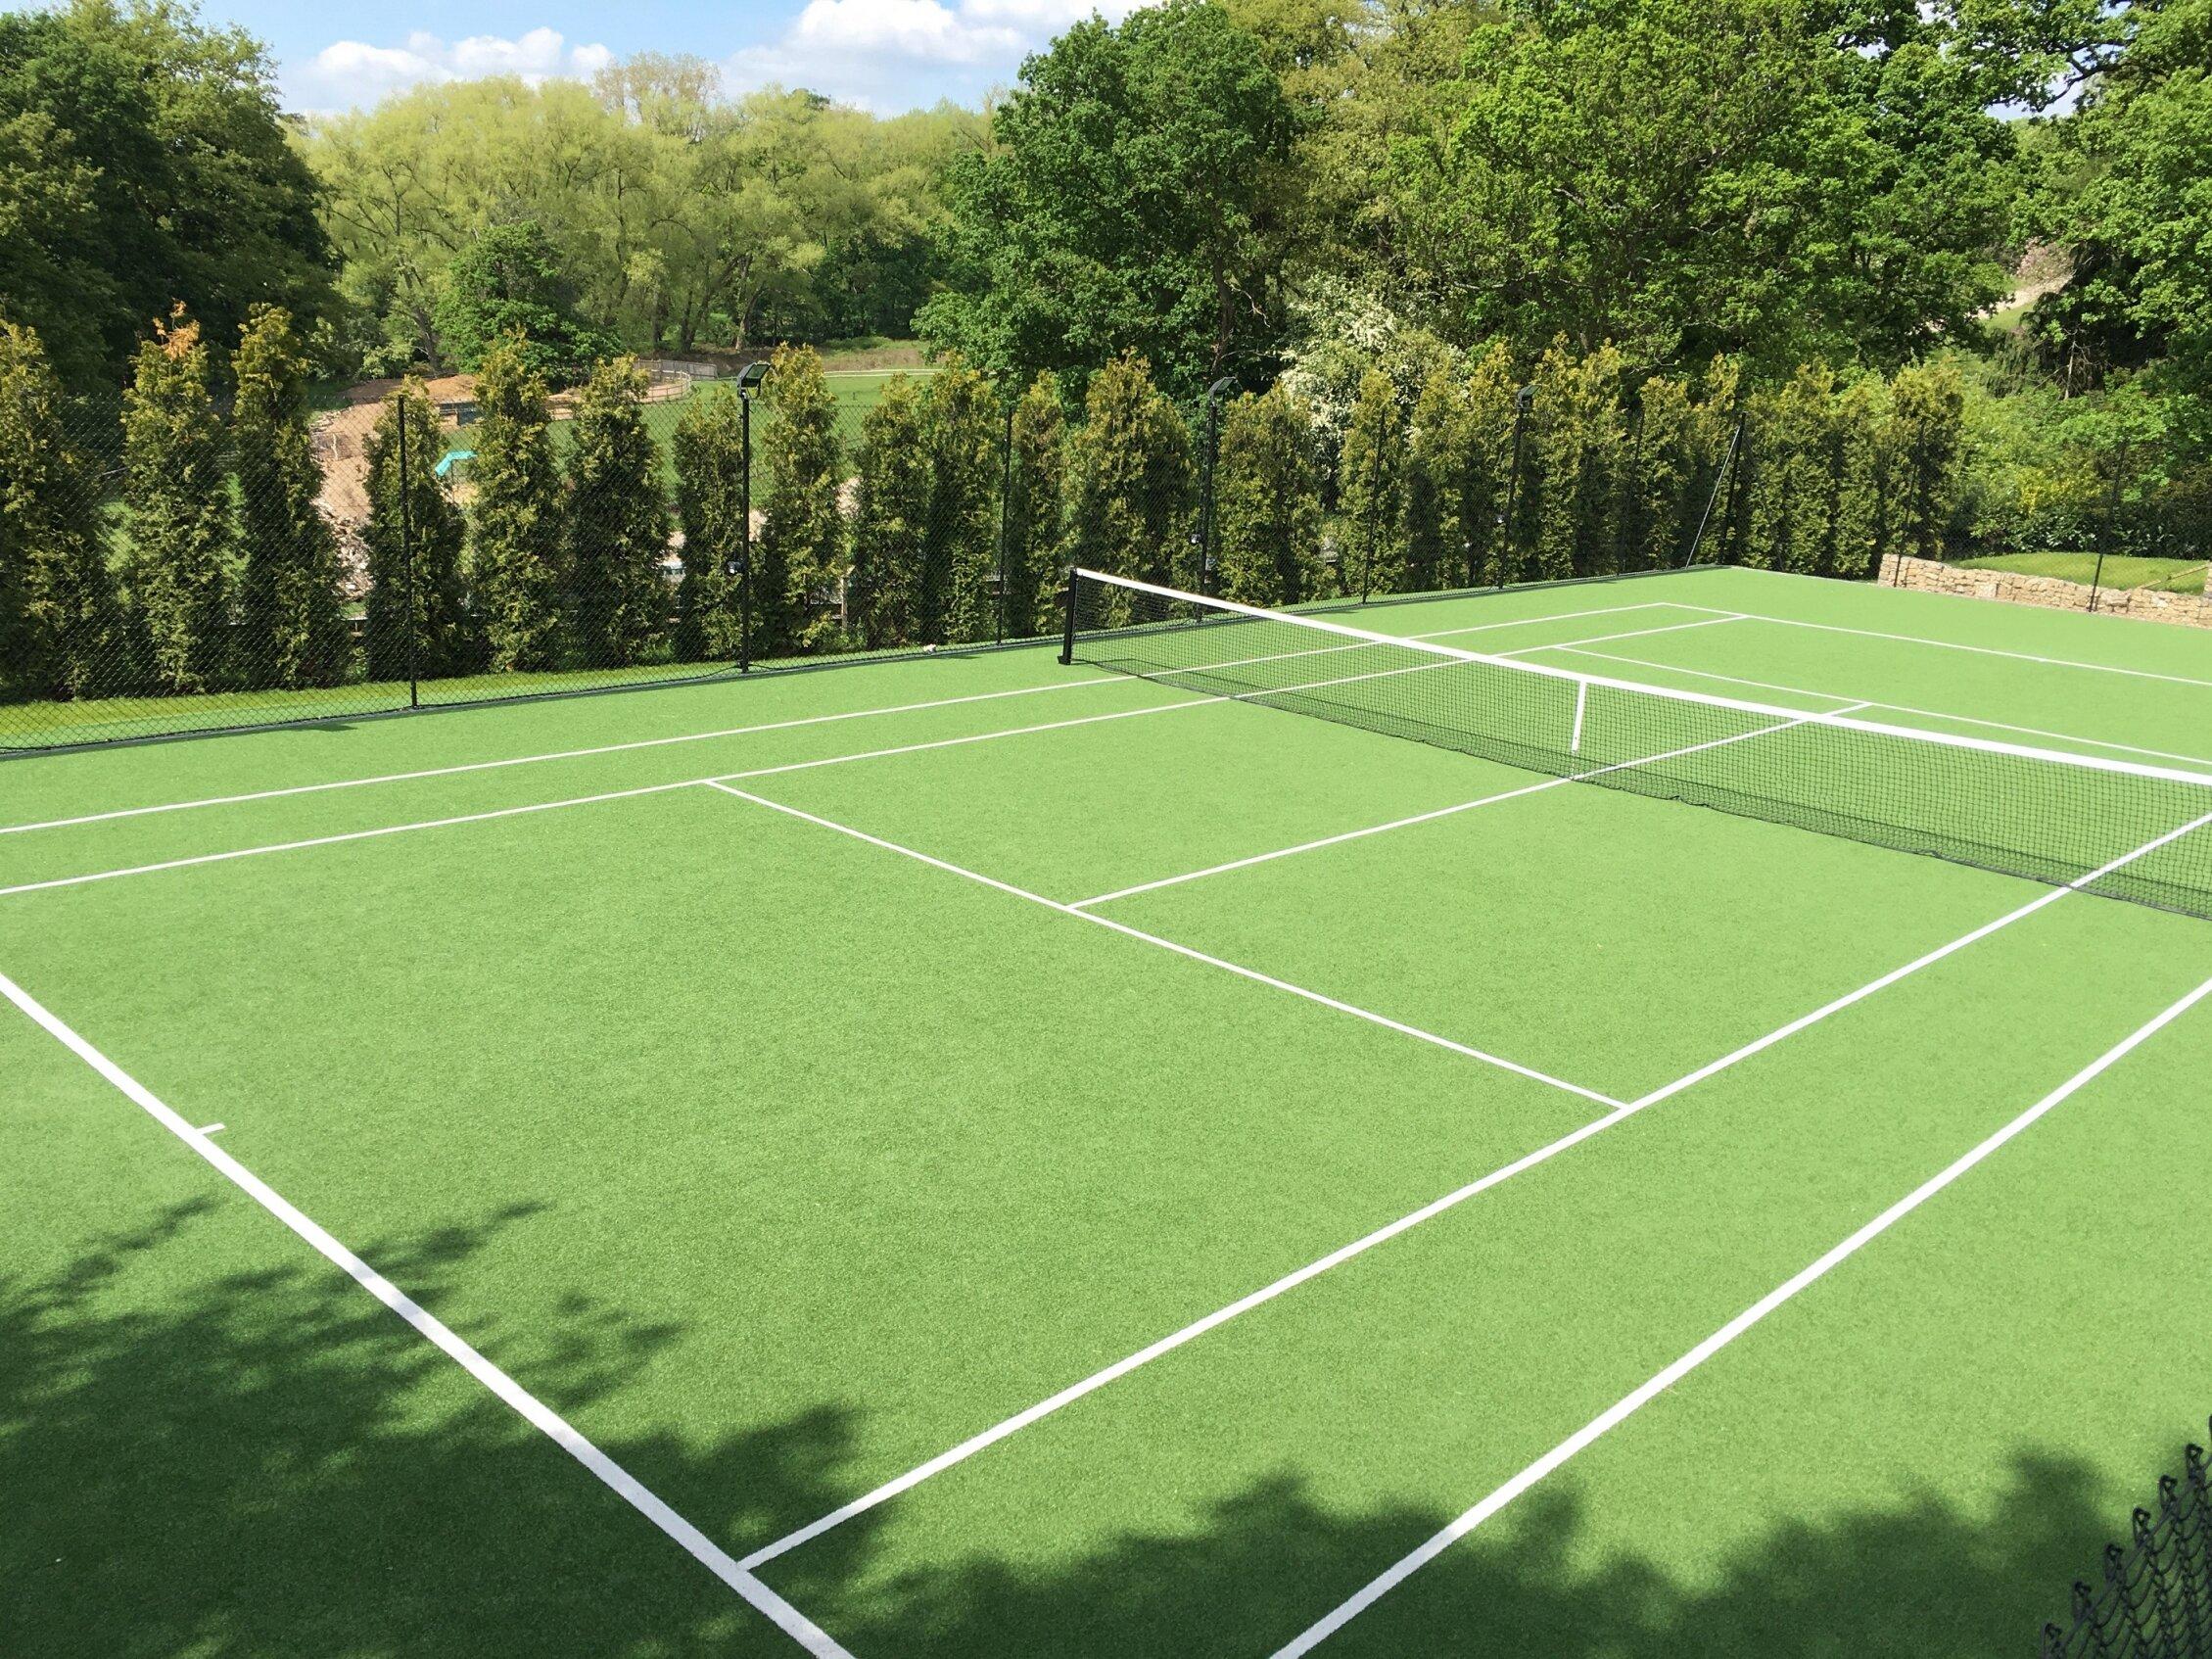 tennis_2000_04__large.jpg